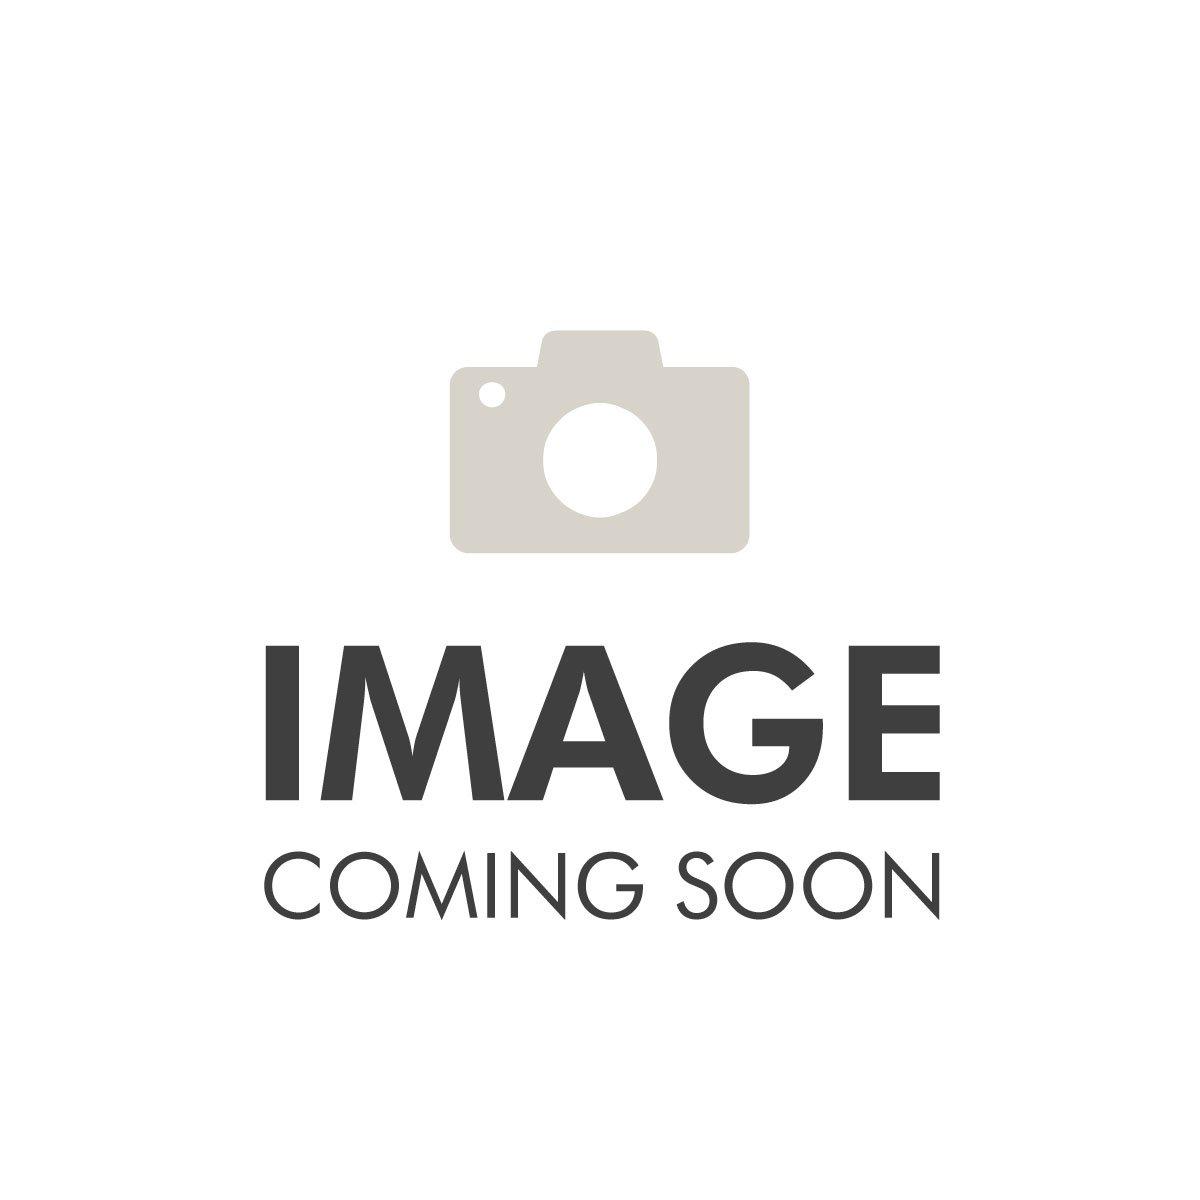 Thierry Mugler Mugler A Men Kryptomint EDT Spray 100ml Limited Edition 2017